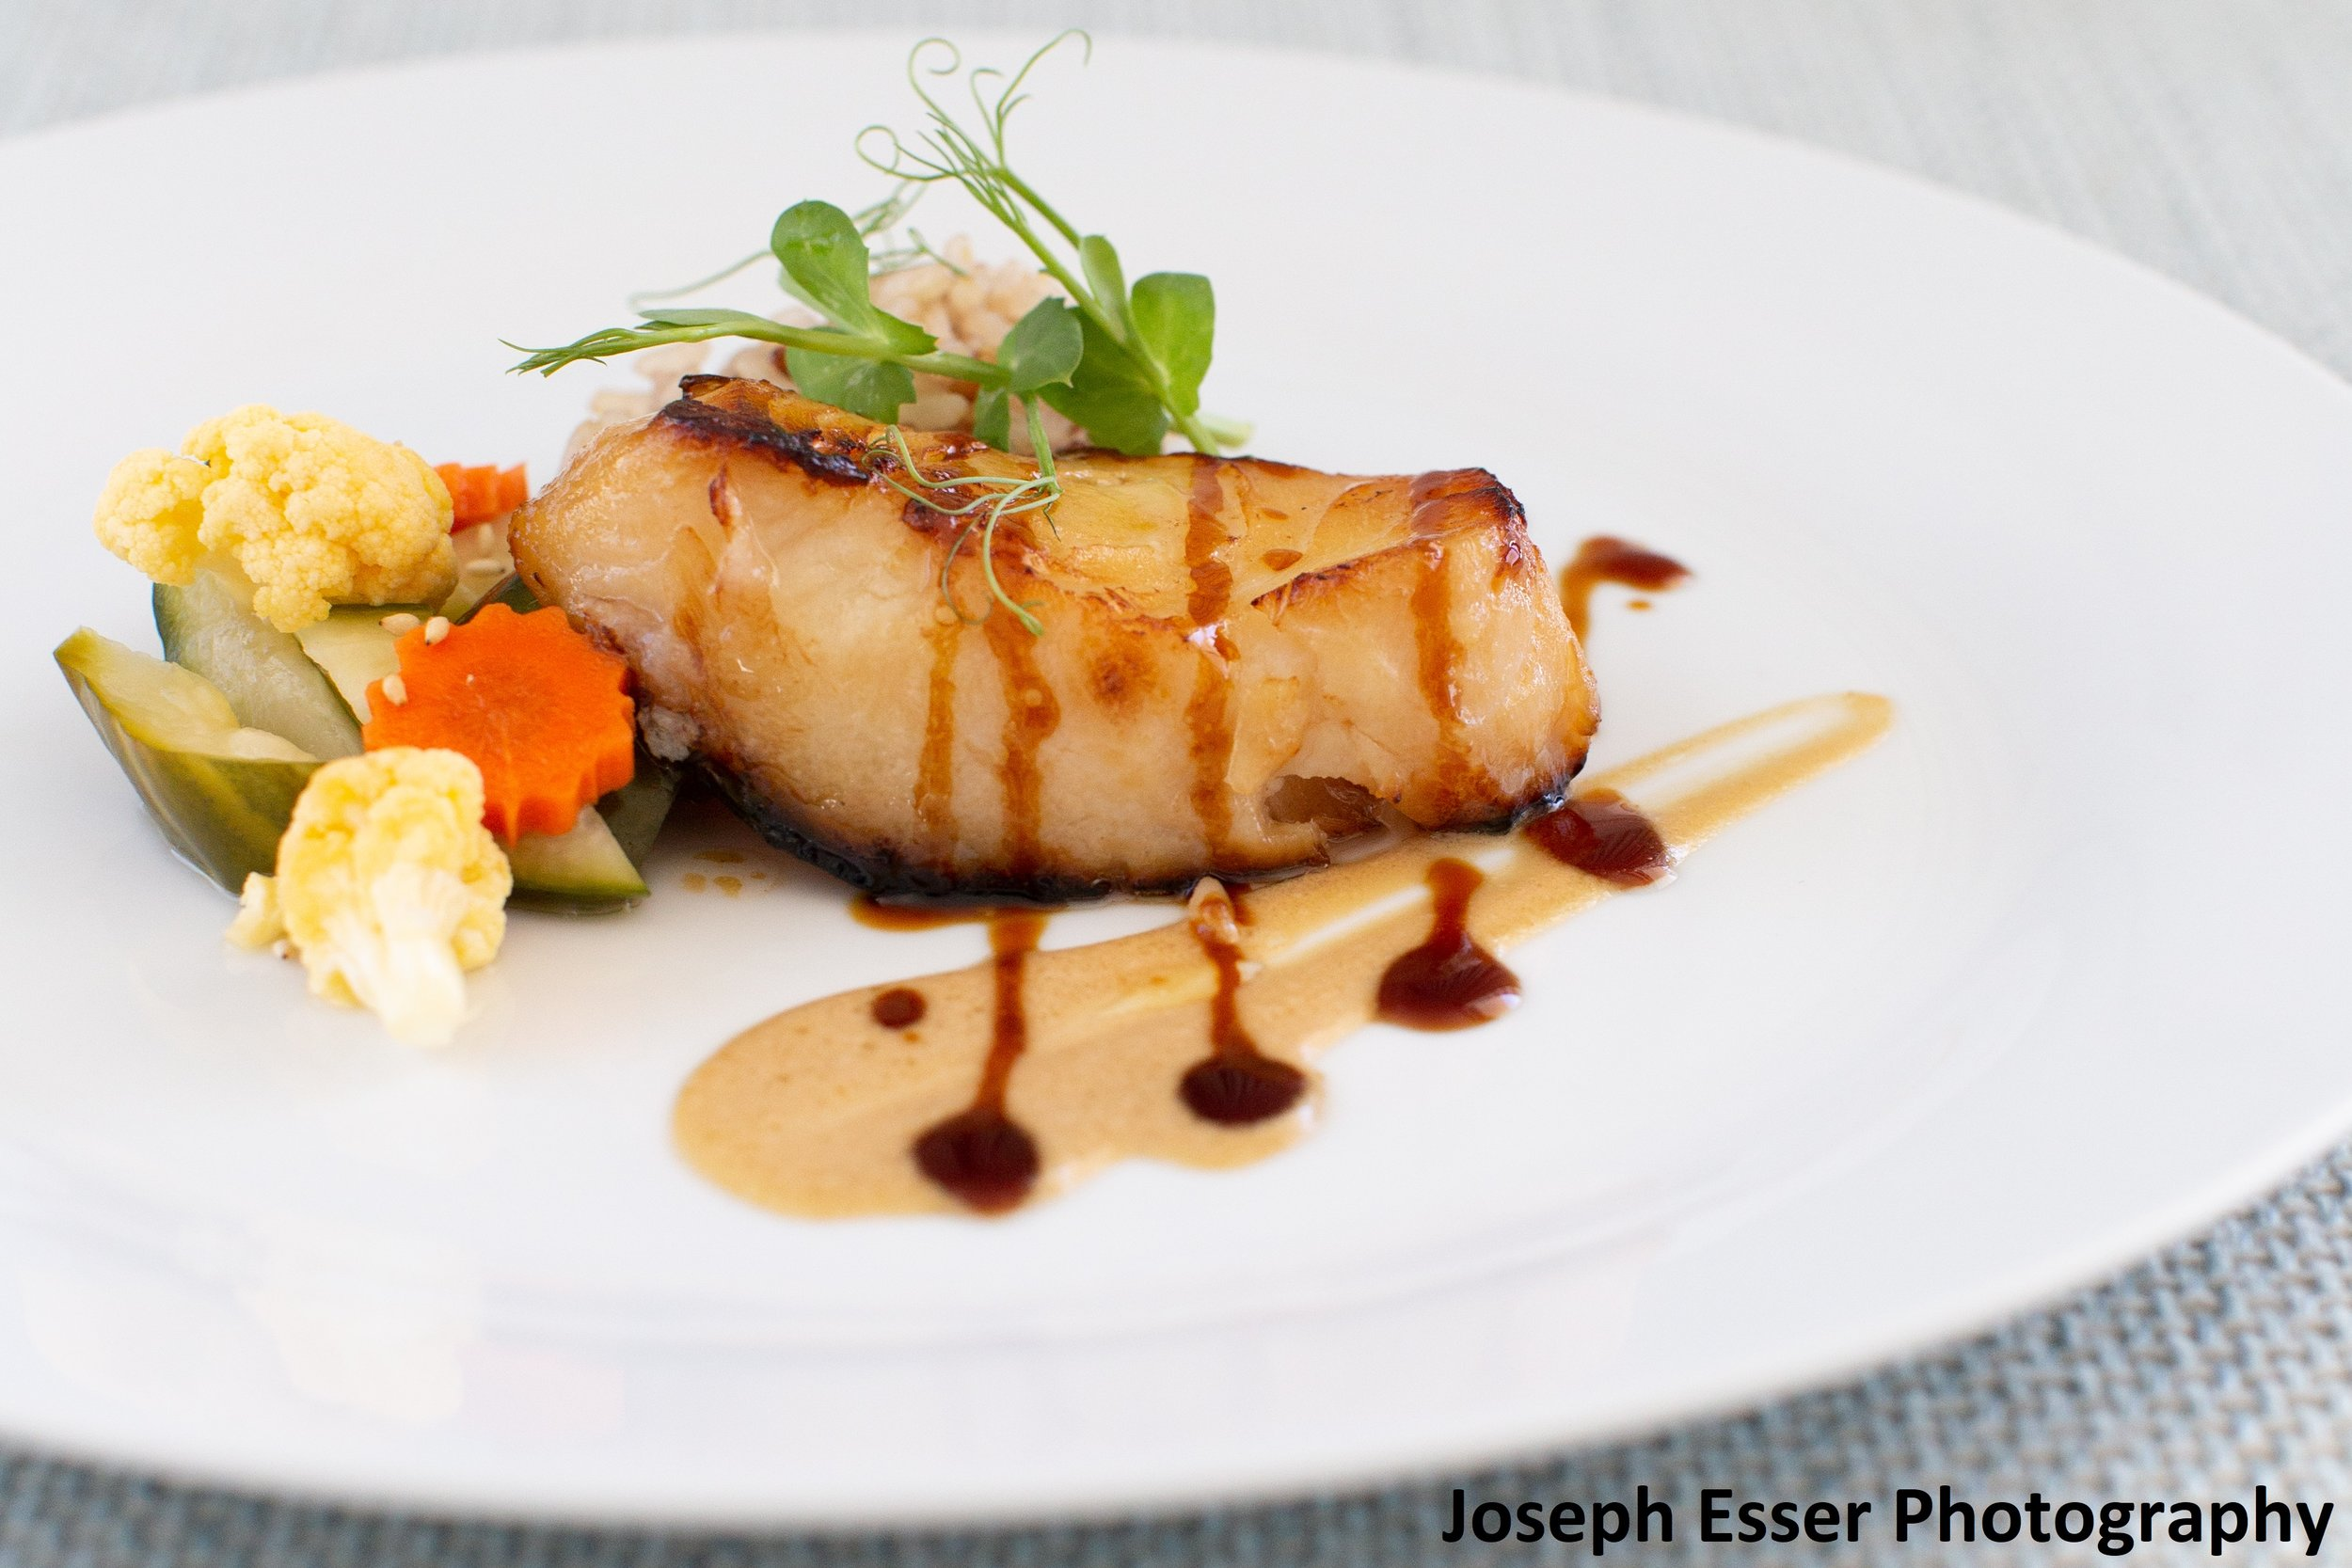 Copy of Ritz Carleton - Food Photos (85 of 98) JEP.jpg